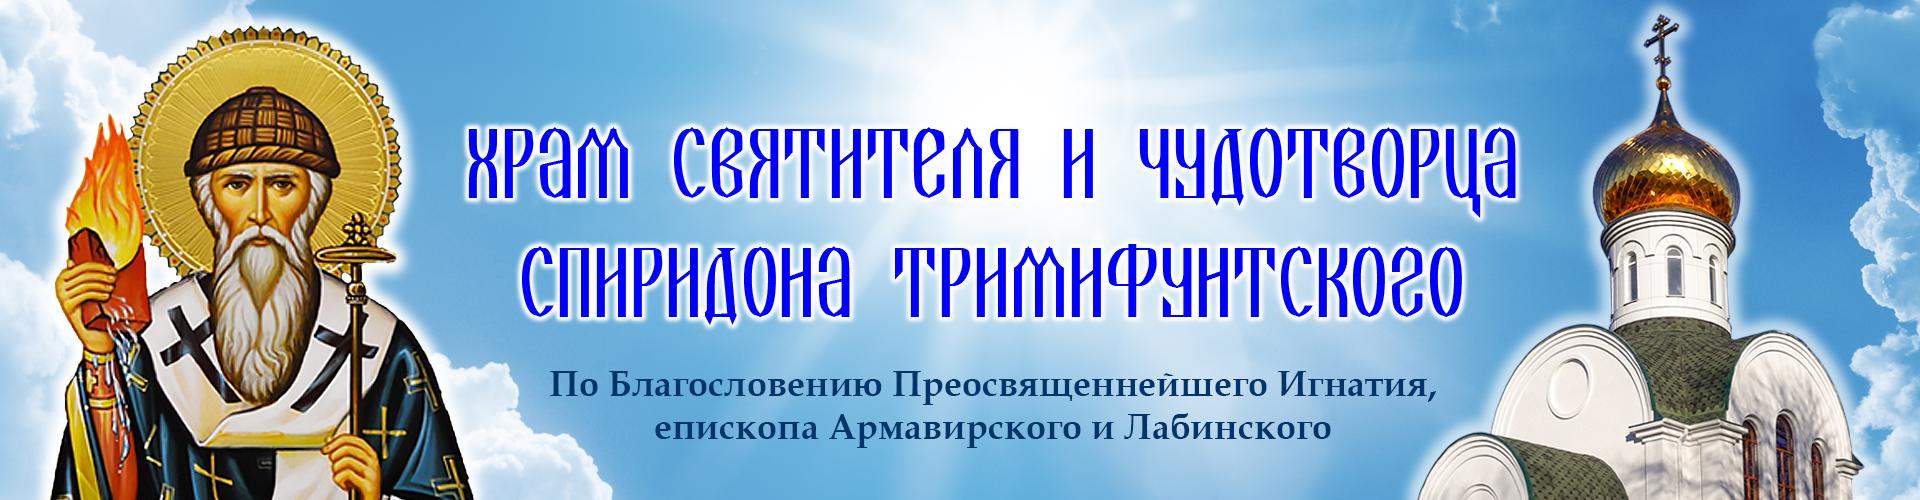 Храм святителя Спиридона Тримифунтского